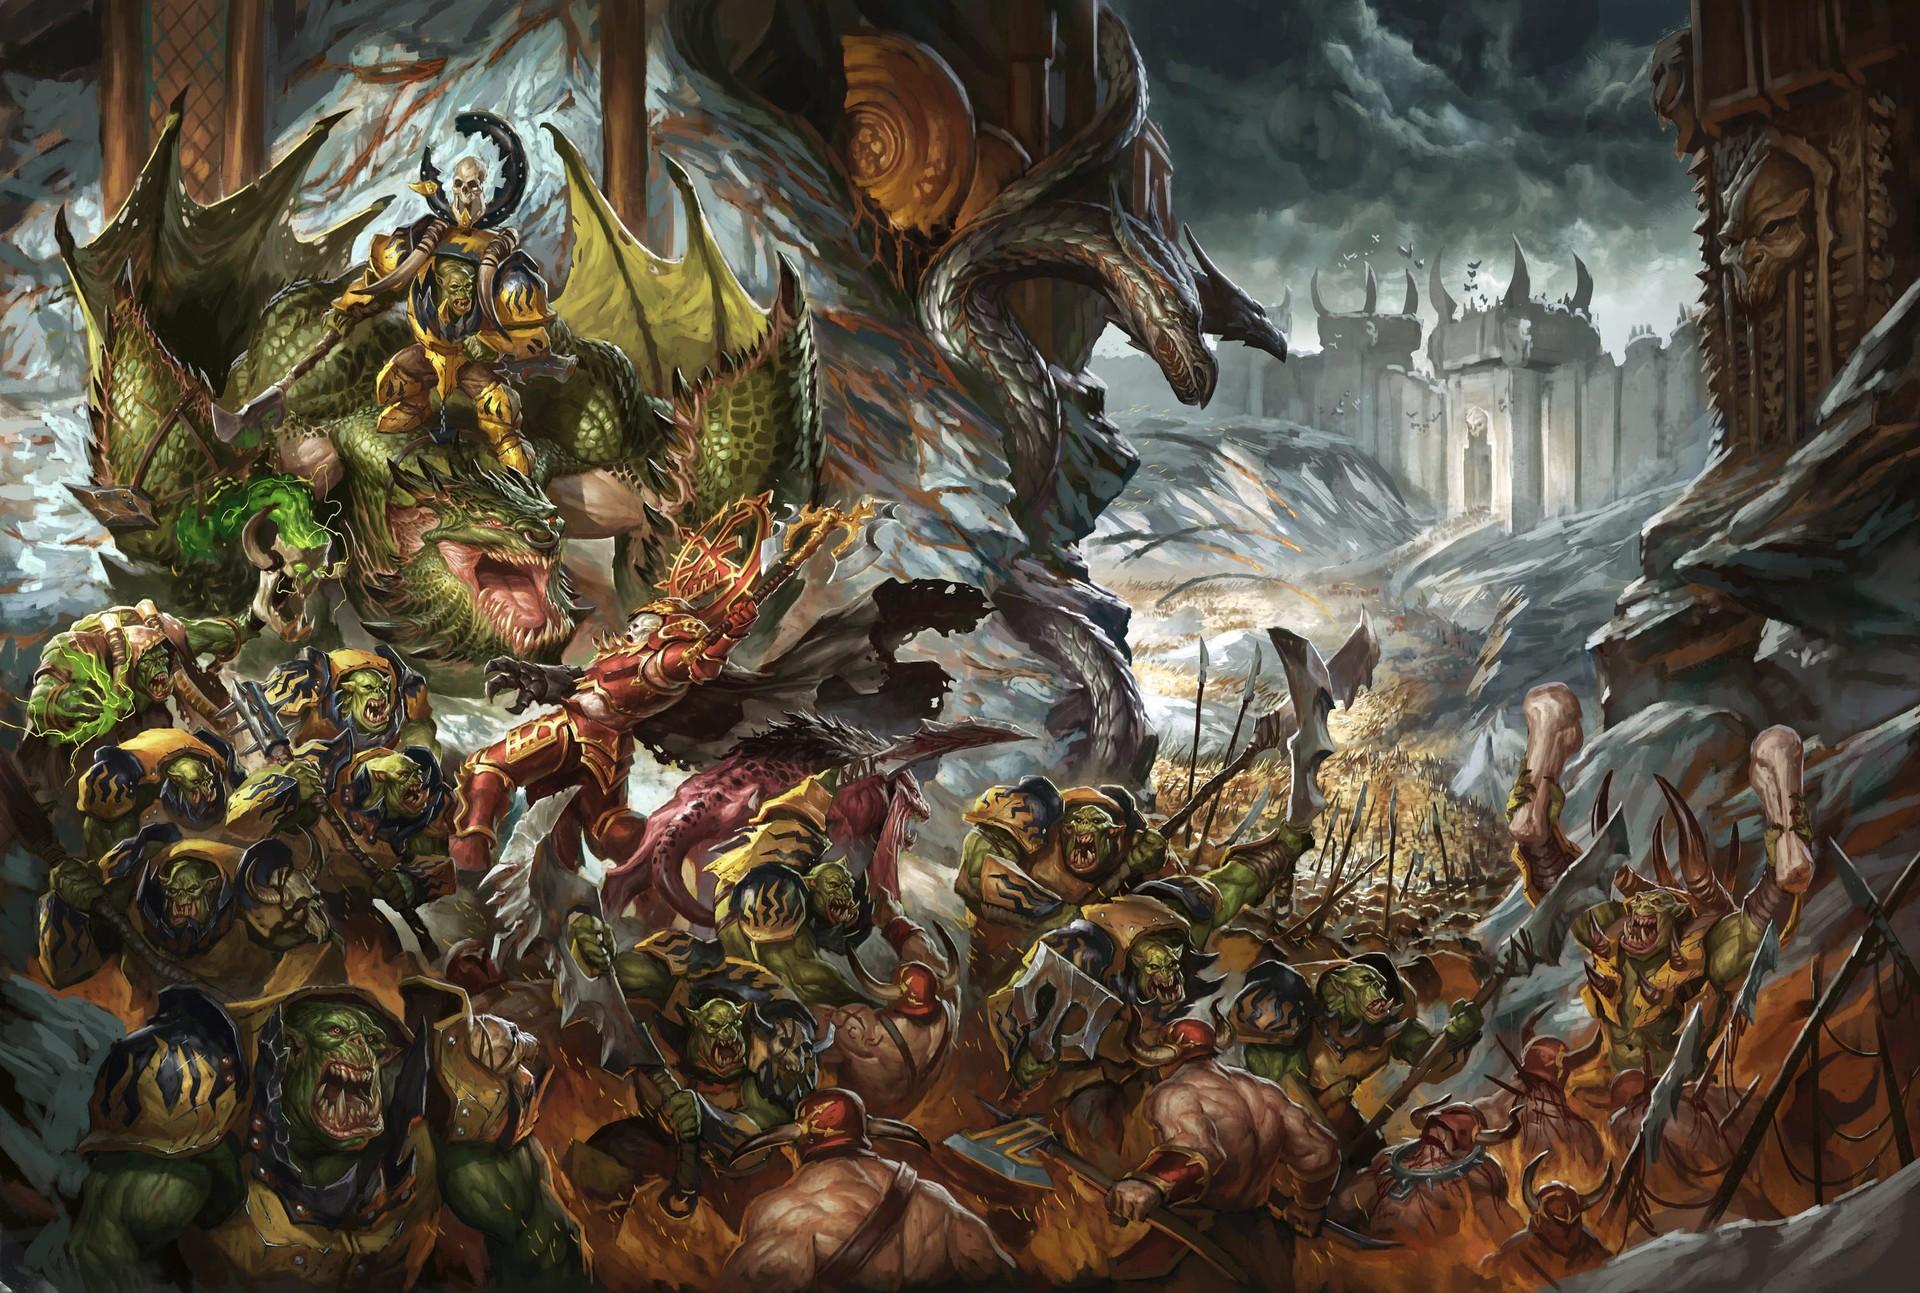 johan-grenier-iron-jaws-vs-blood-bound-c